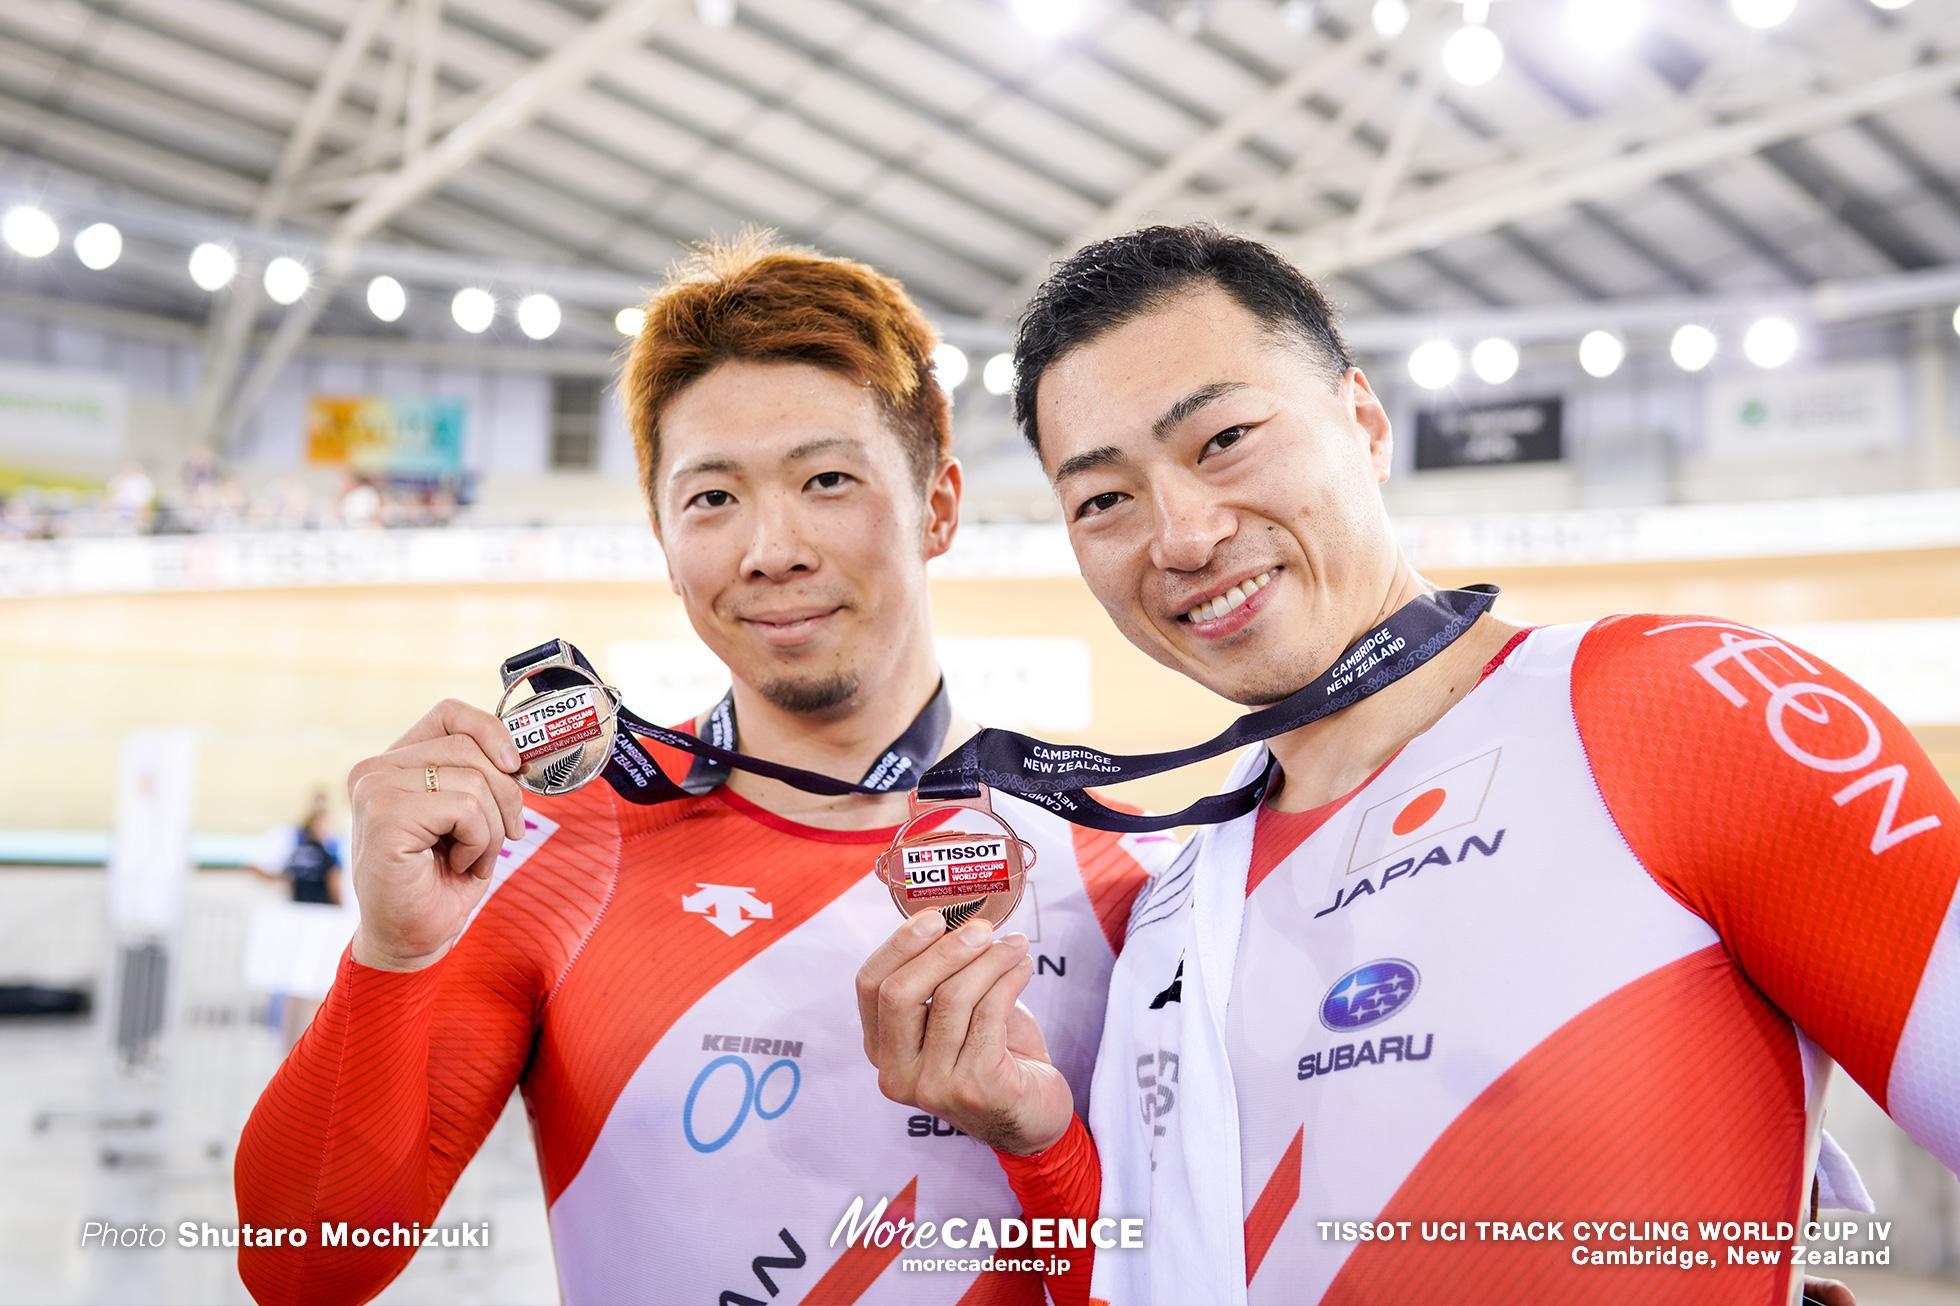 Final / Men's Sprint / TISSOT UCI TRACK CYCLING WORLD CUP IV, Cambridge, New Zealand, 深谷知広 新田祐大